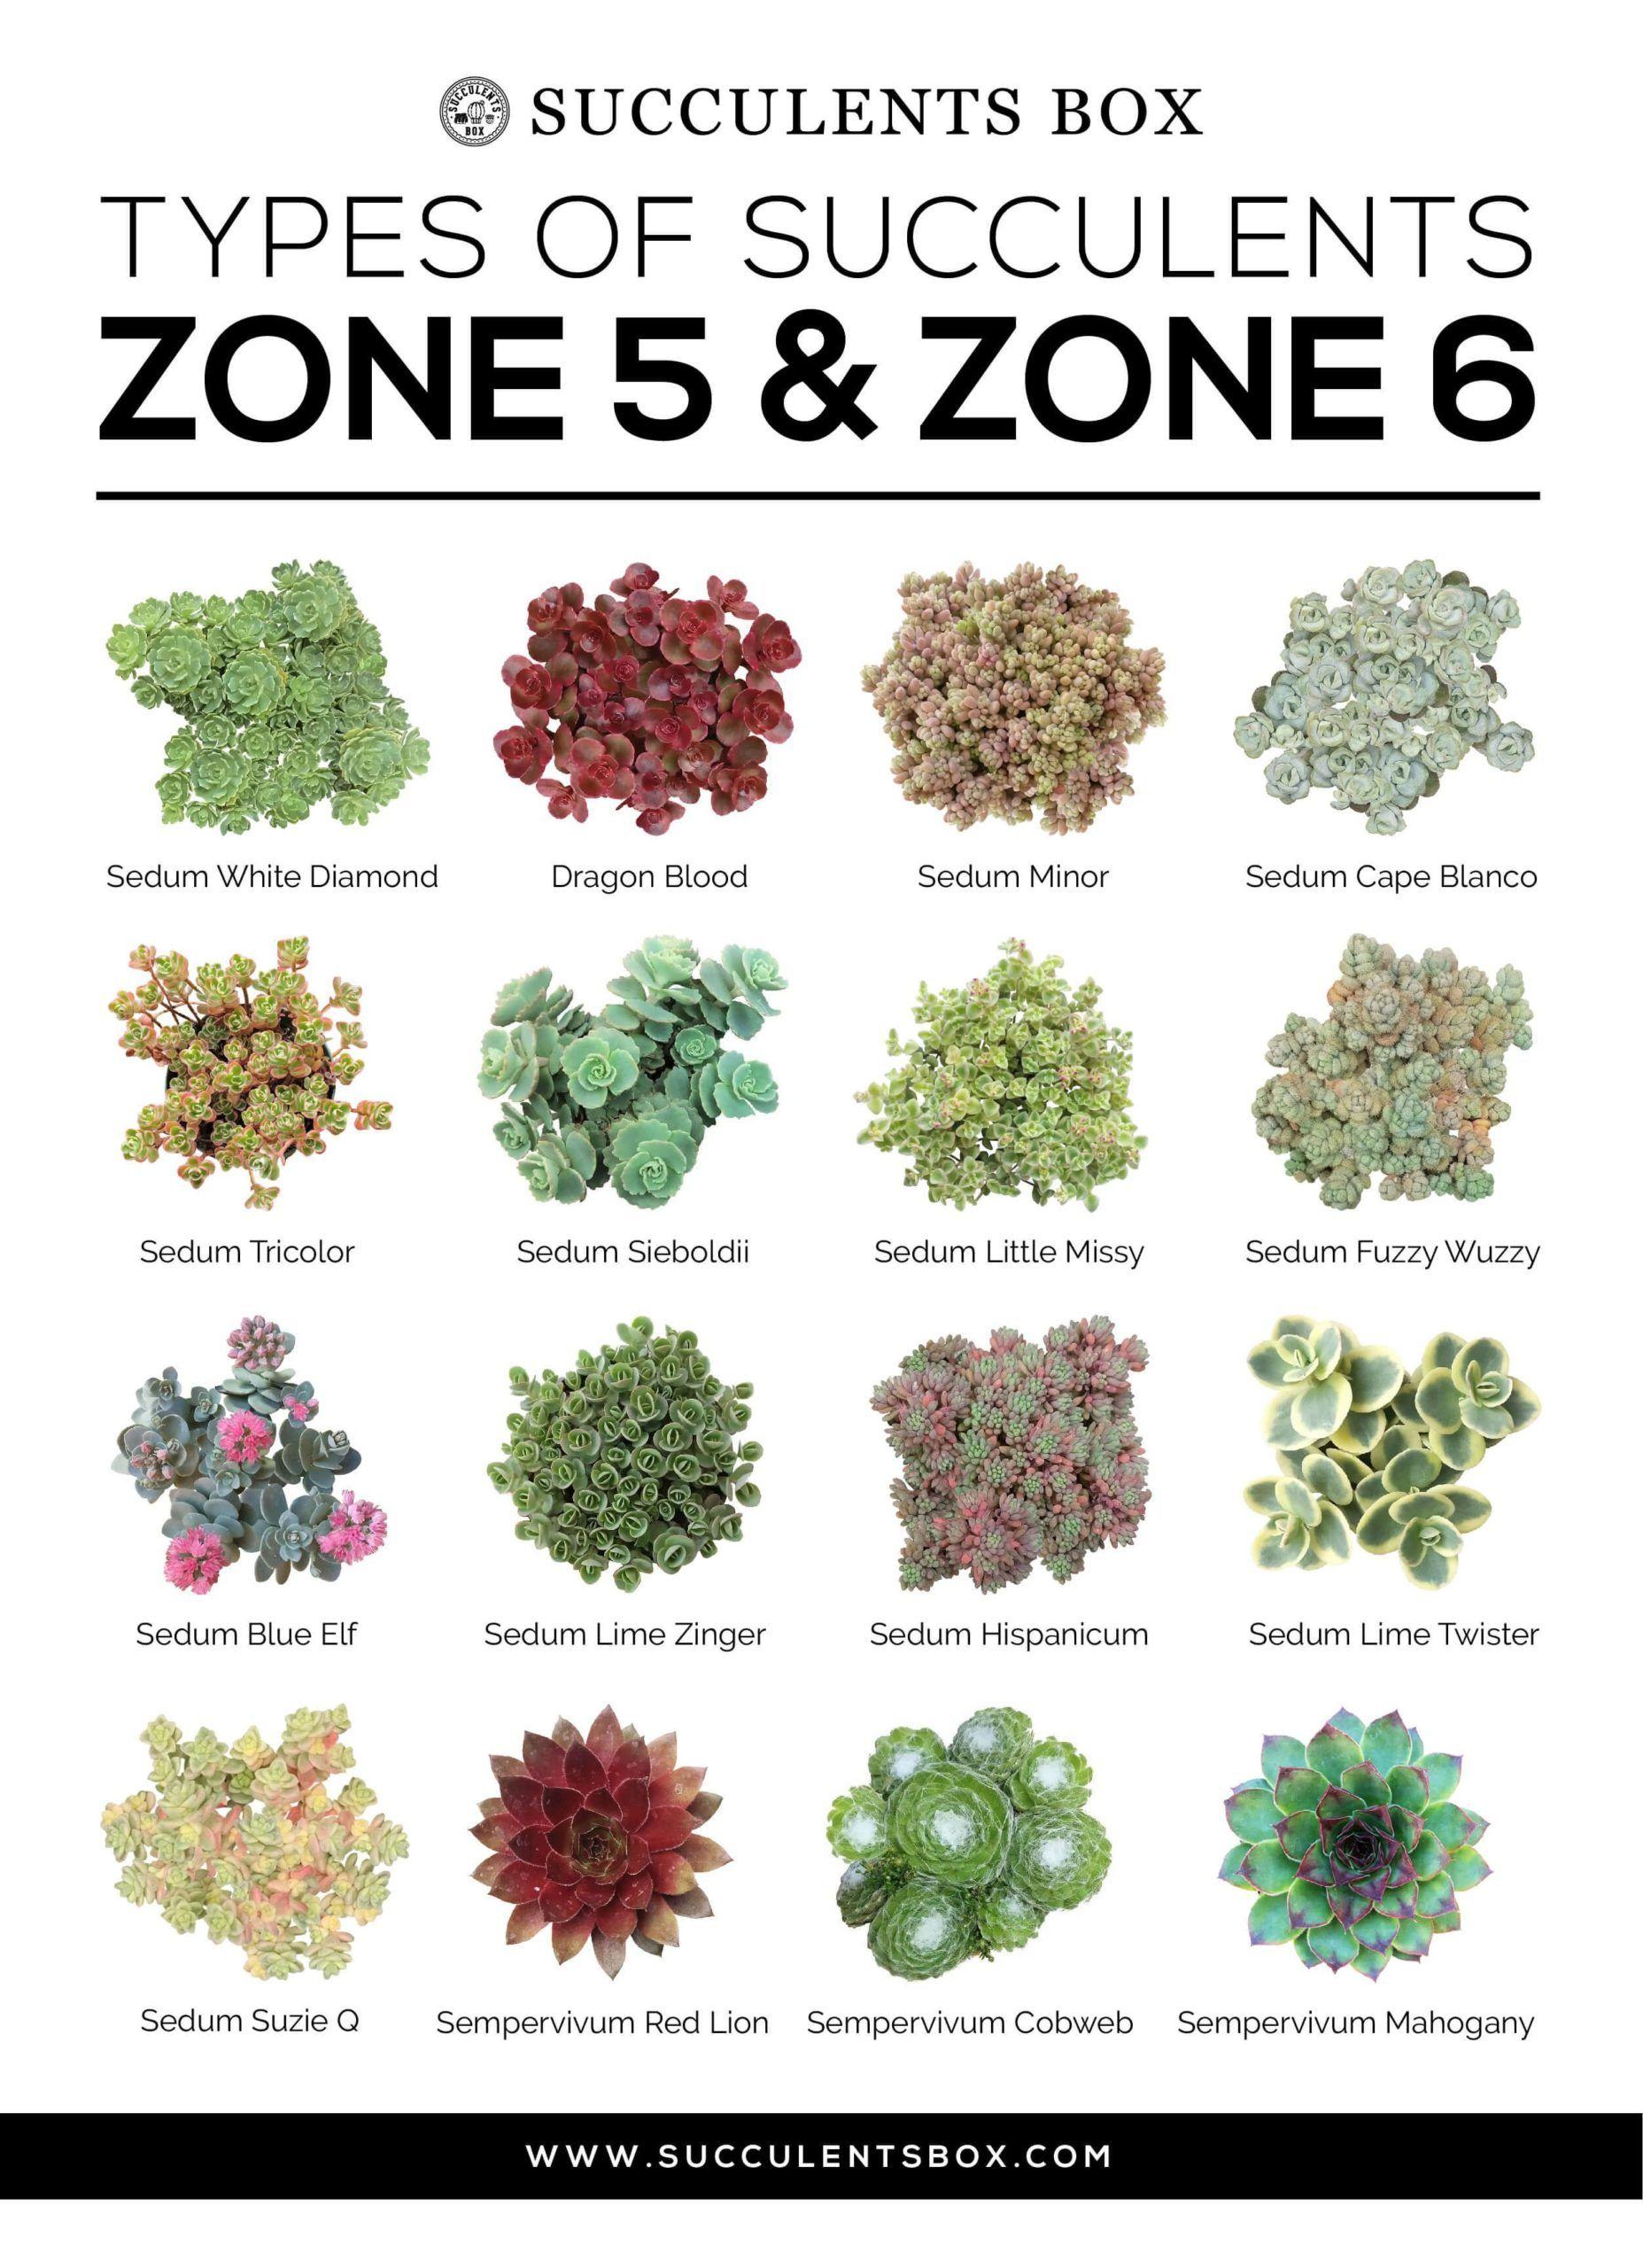 8e0143bb2b59eebe32df3481a43558bb - What Gardening Zone Is Minnesota In